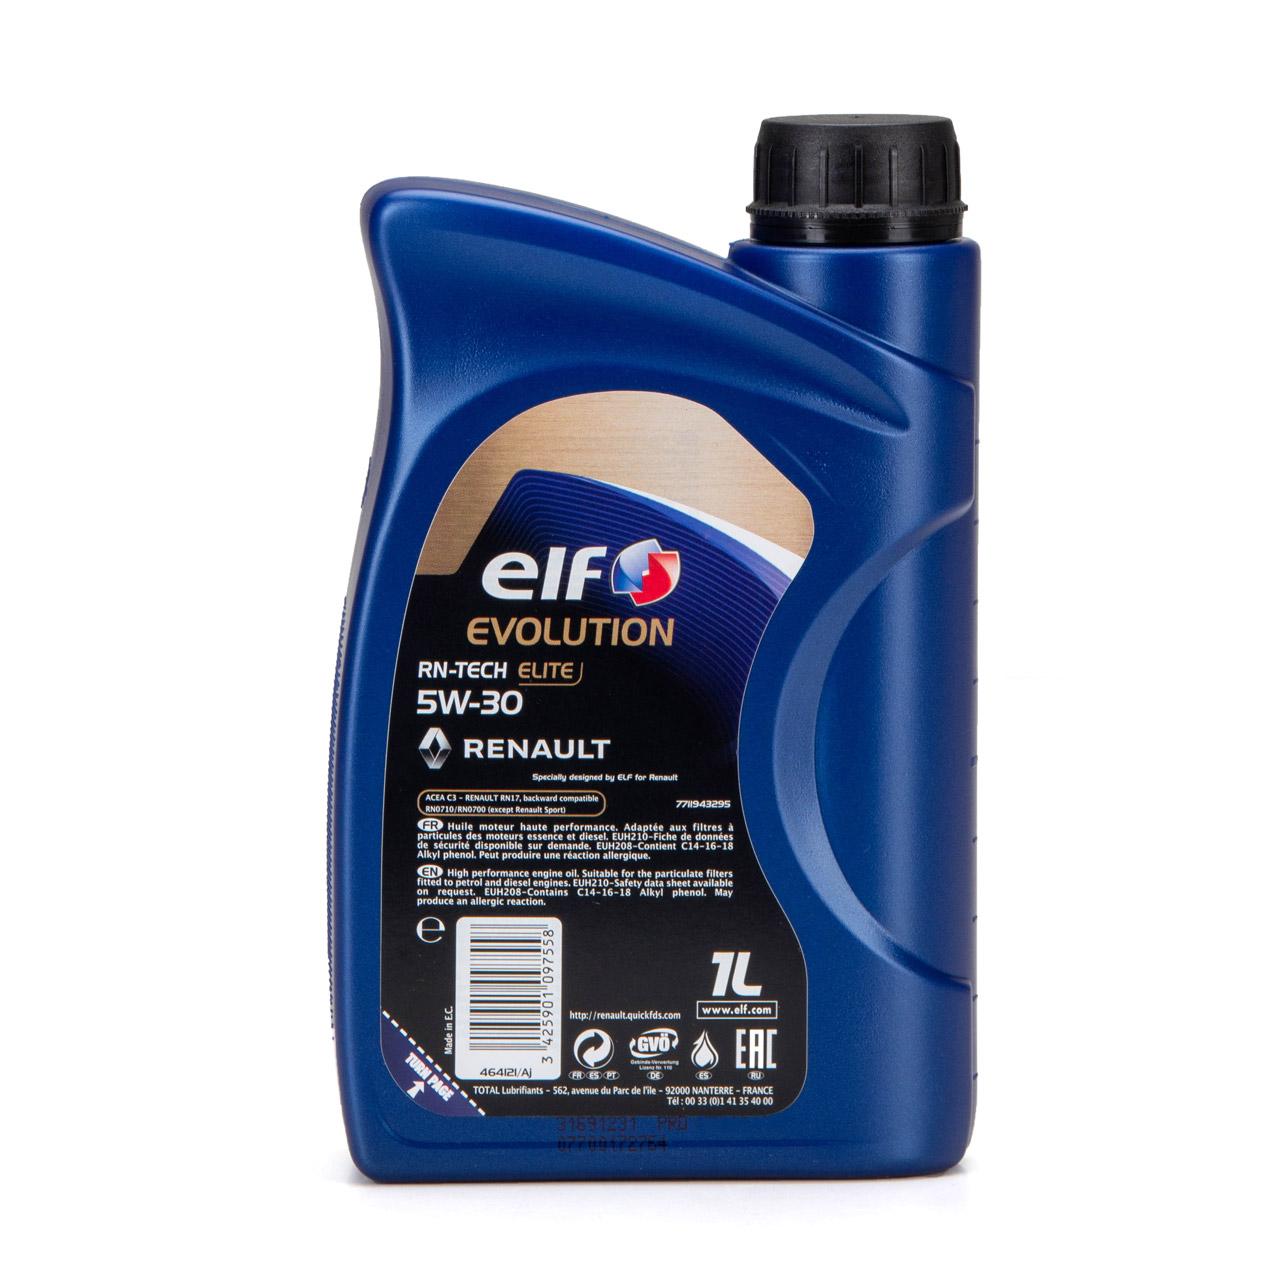 elf Evolution RN-TECH ELITE 5W-30 5W30 Motoröl Öl C3 Renault RN17 - 1L 1 Liter